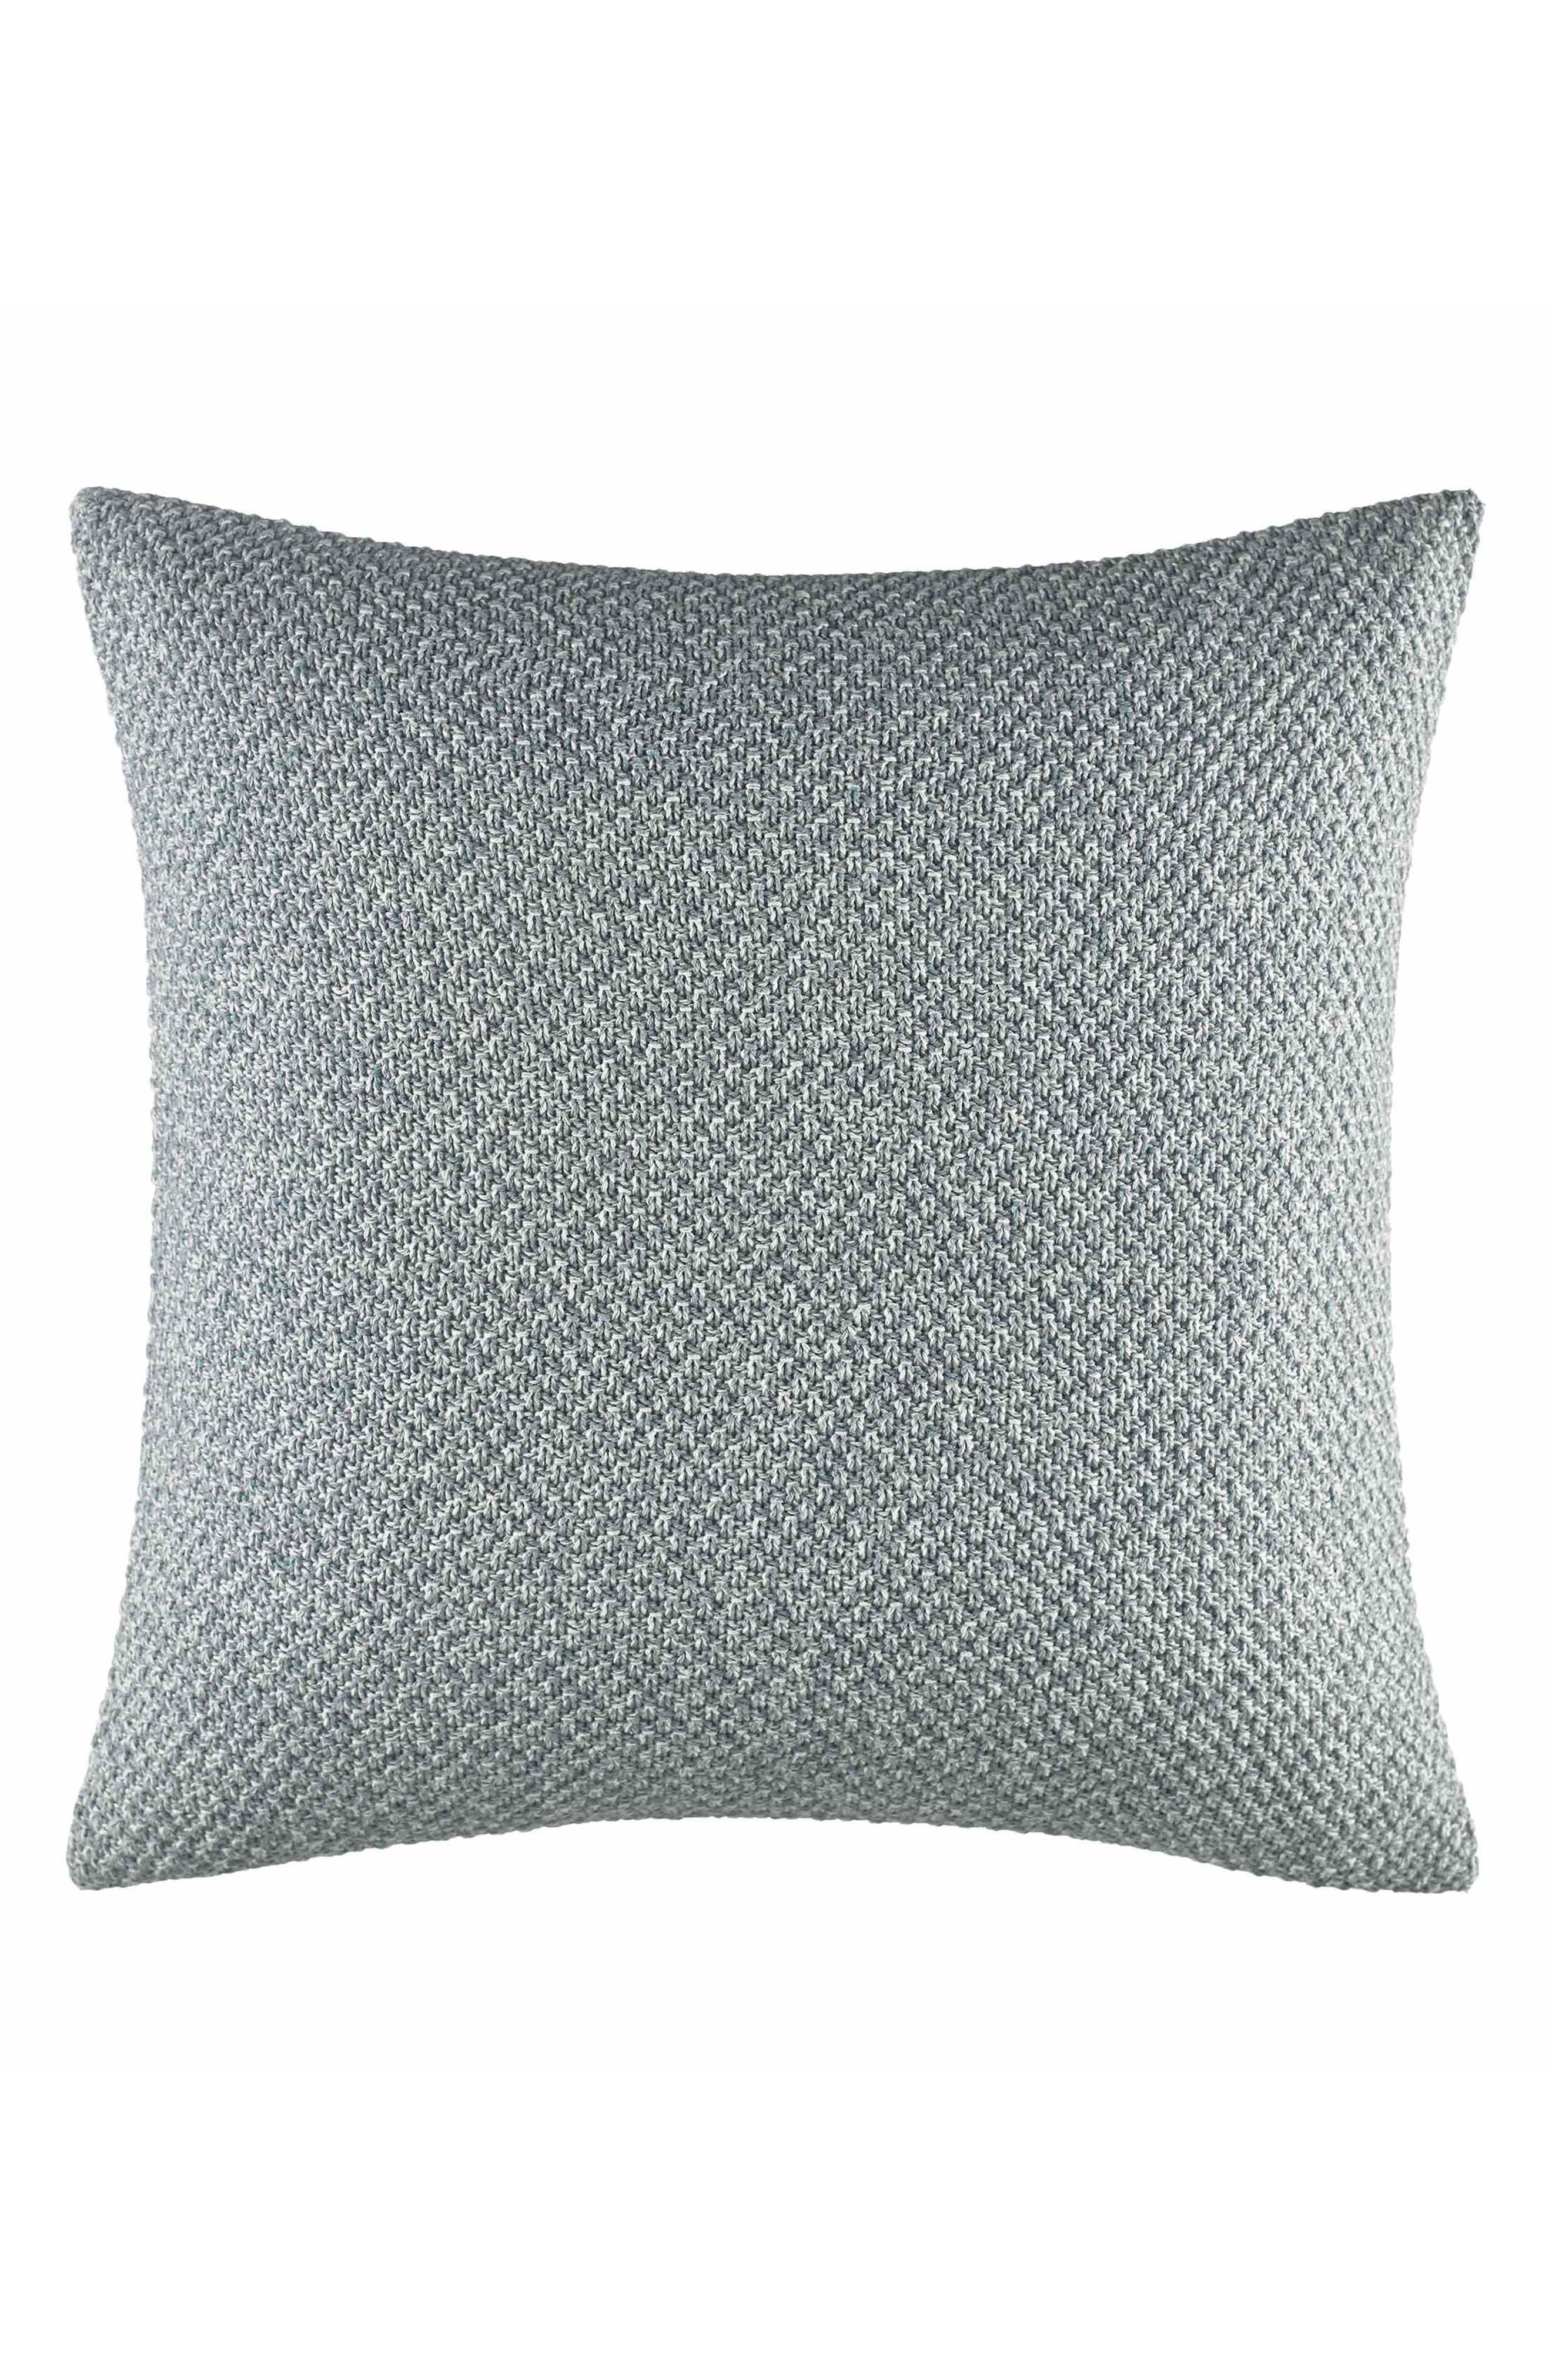 Cape Coral Knit Pillow,                         Main,                         color, Turquoise